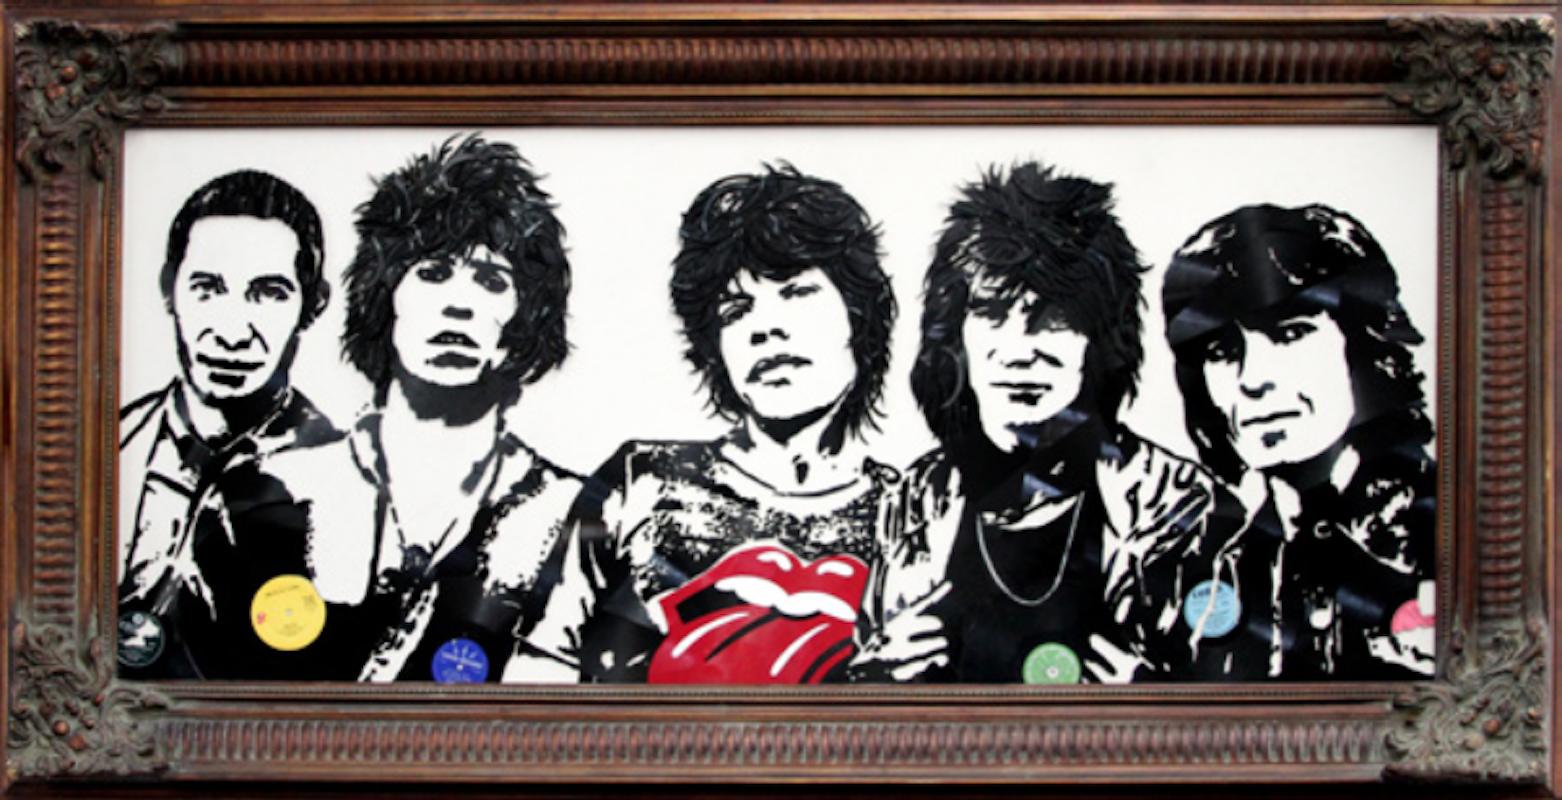 Rolling Stones by Mr. Brainwash